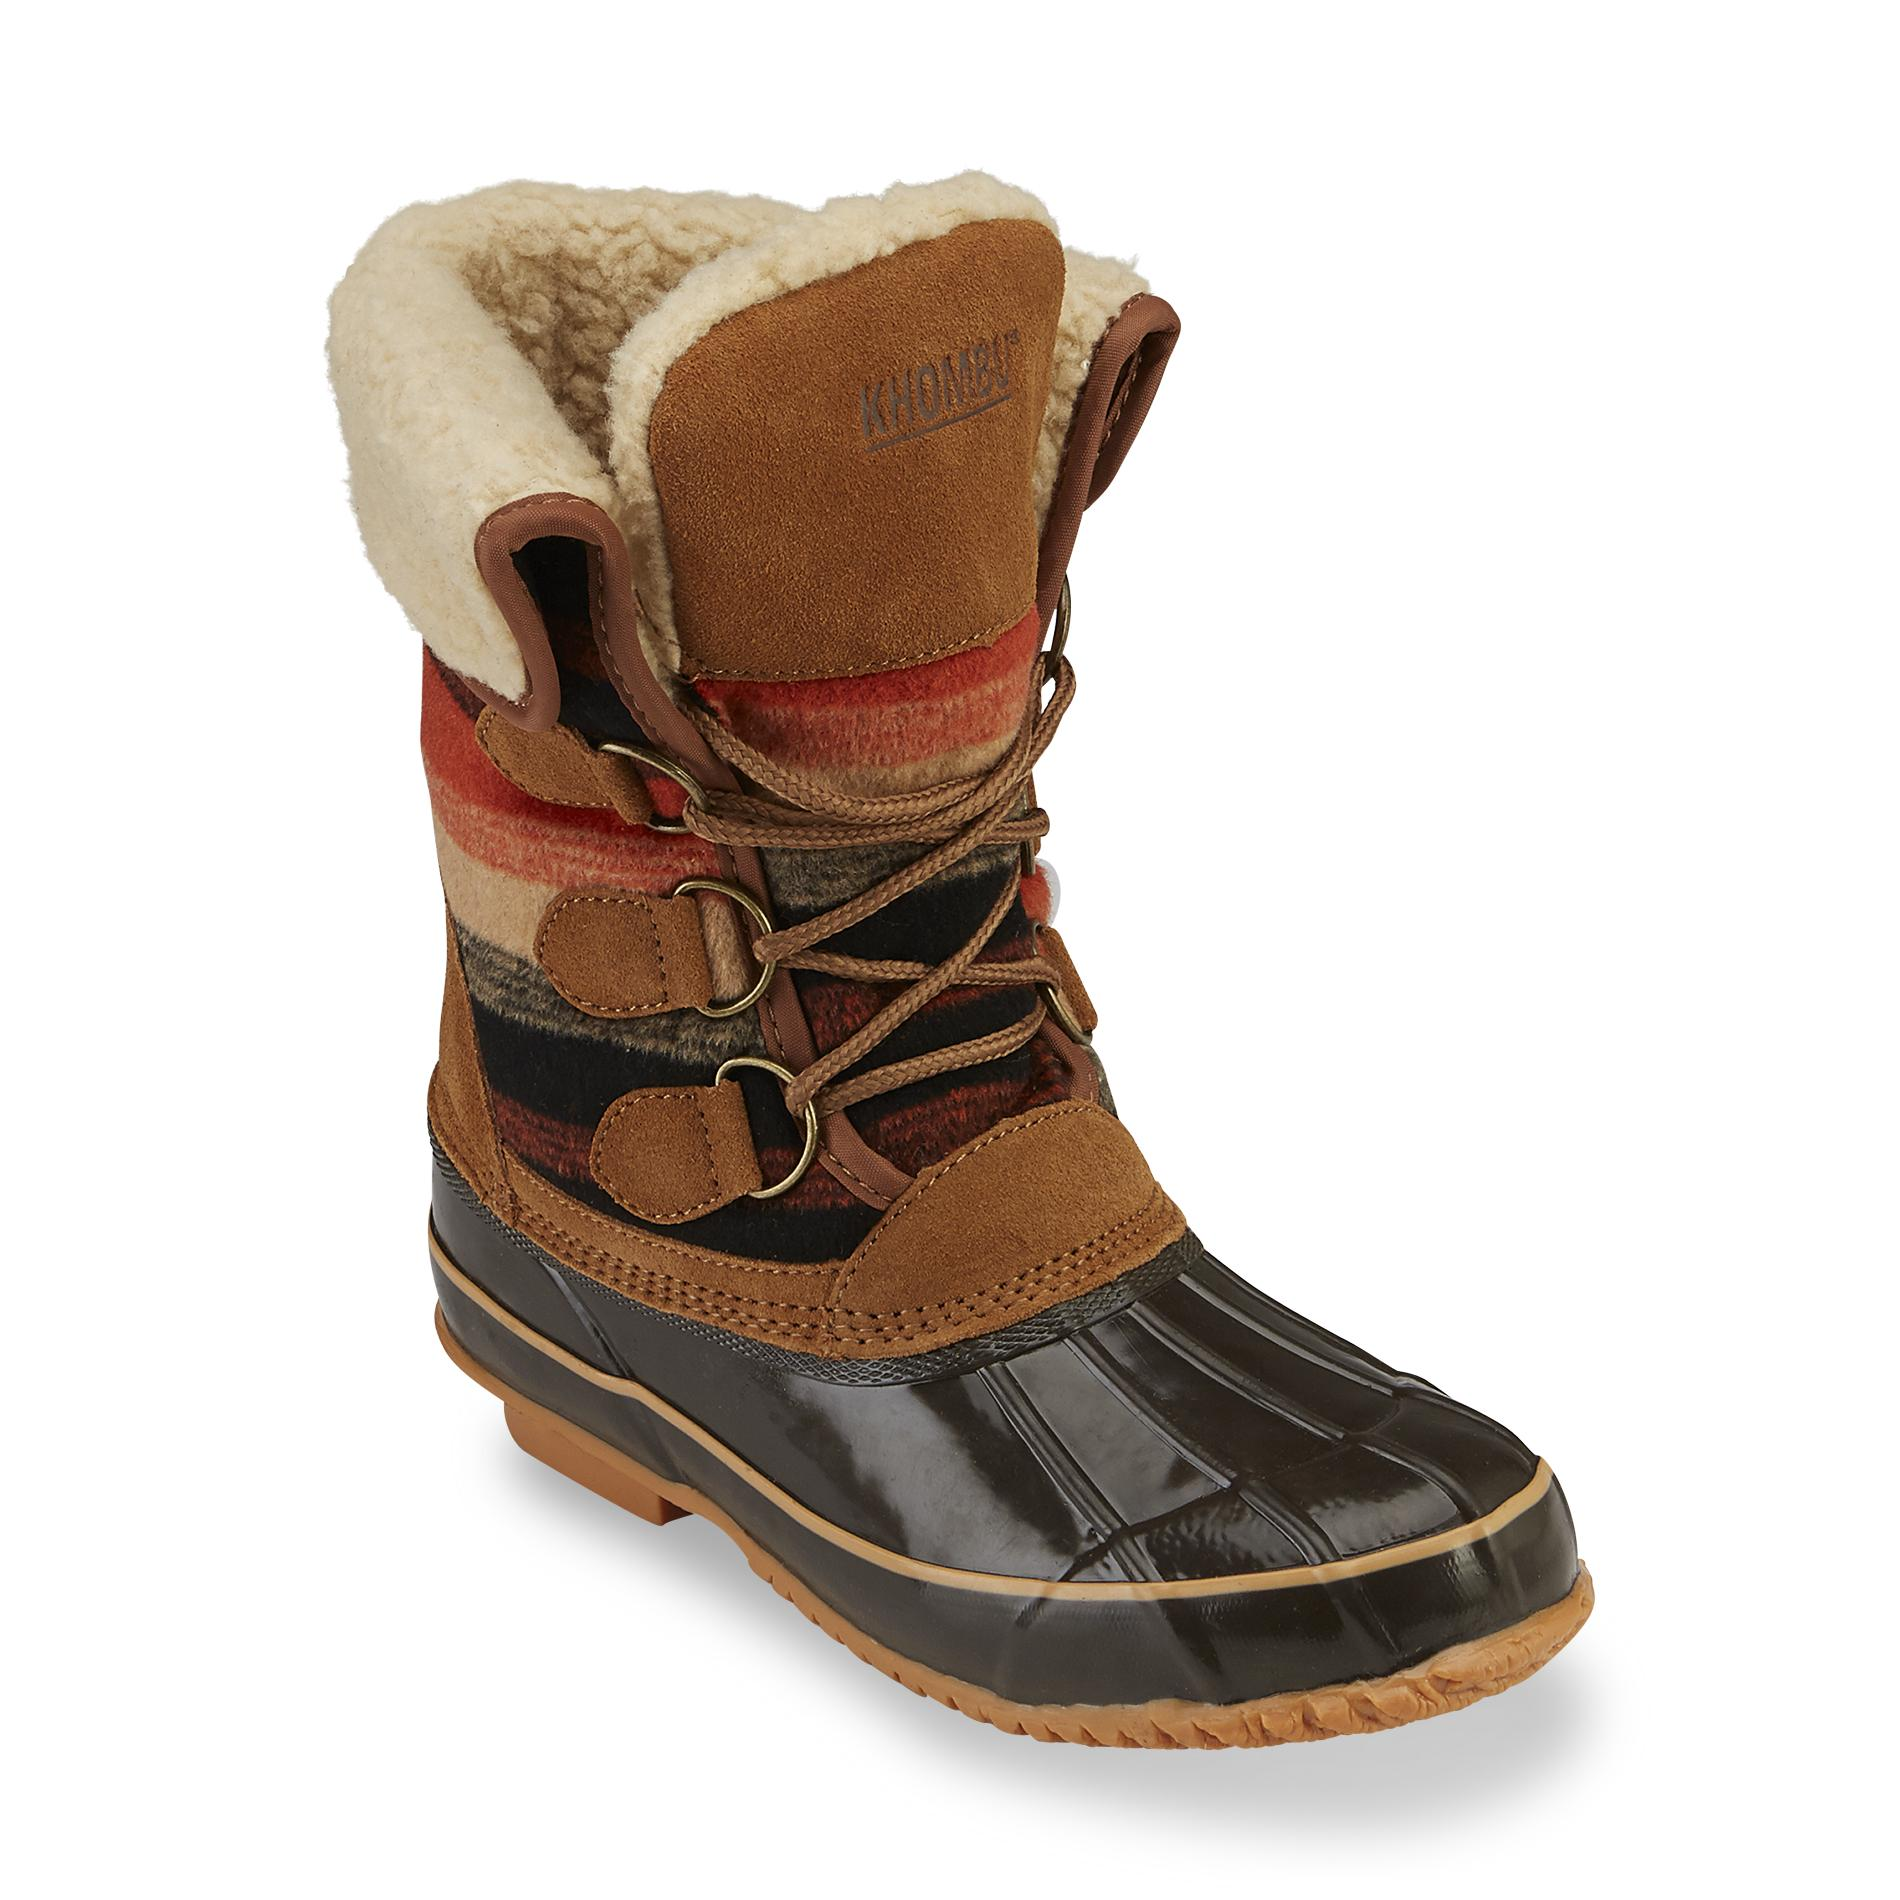 khombu boots khombu womenu0027s jilly brown/multicolor waterproof winter boot DGOKUHK